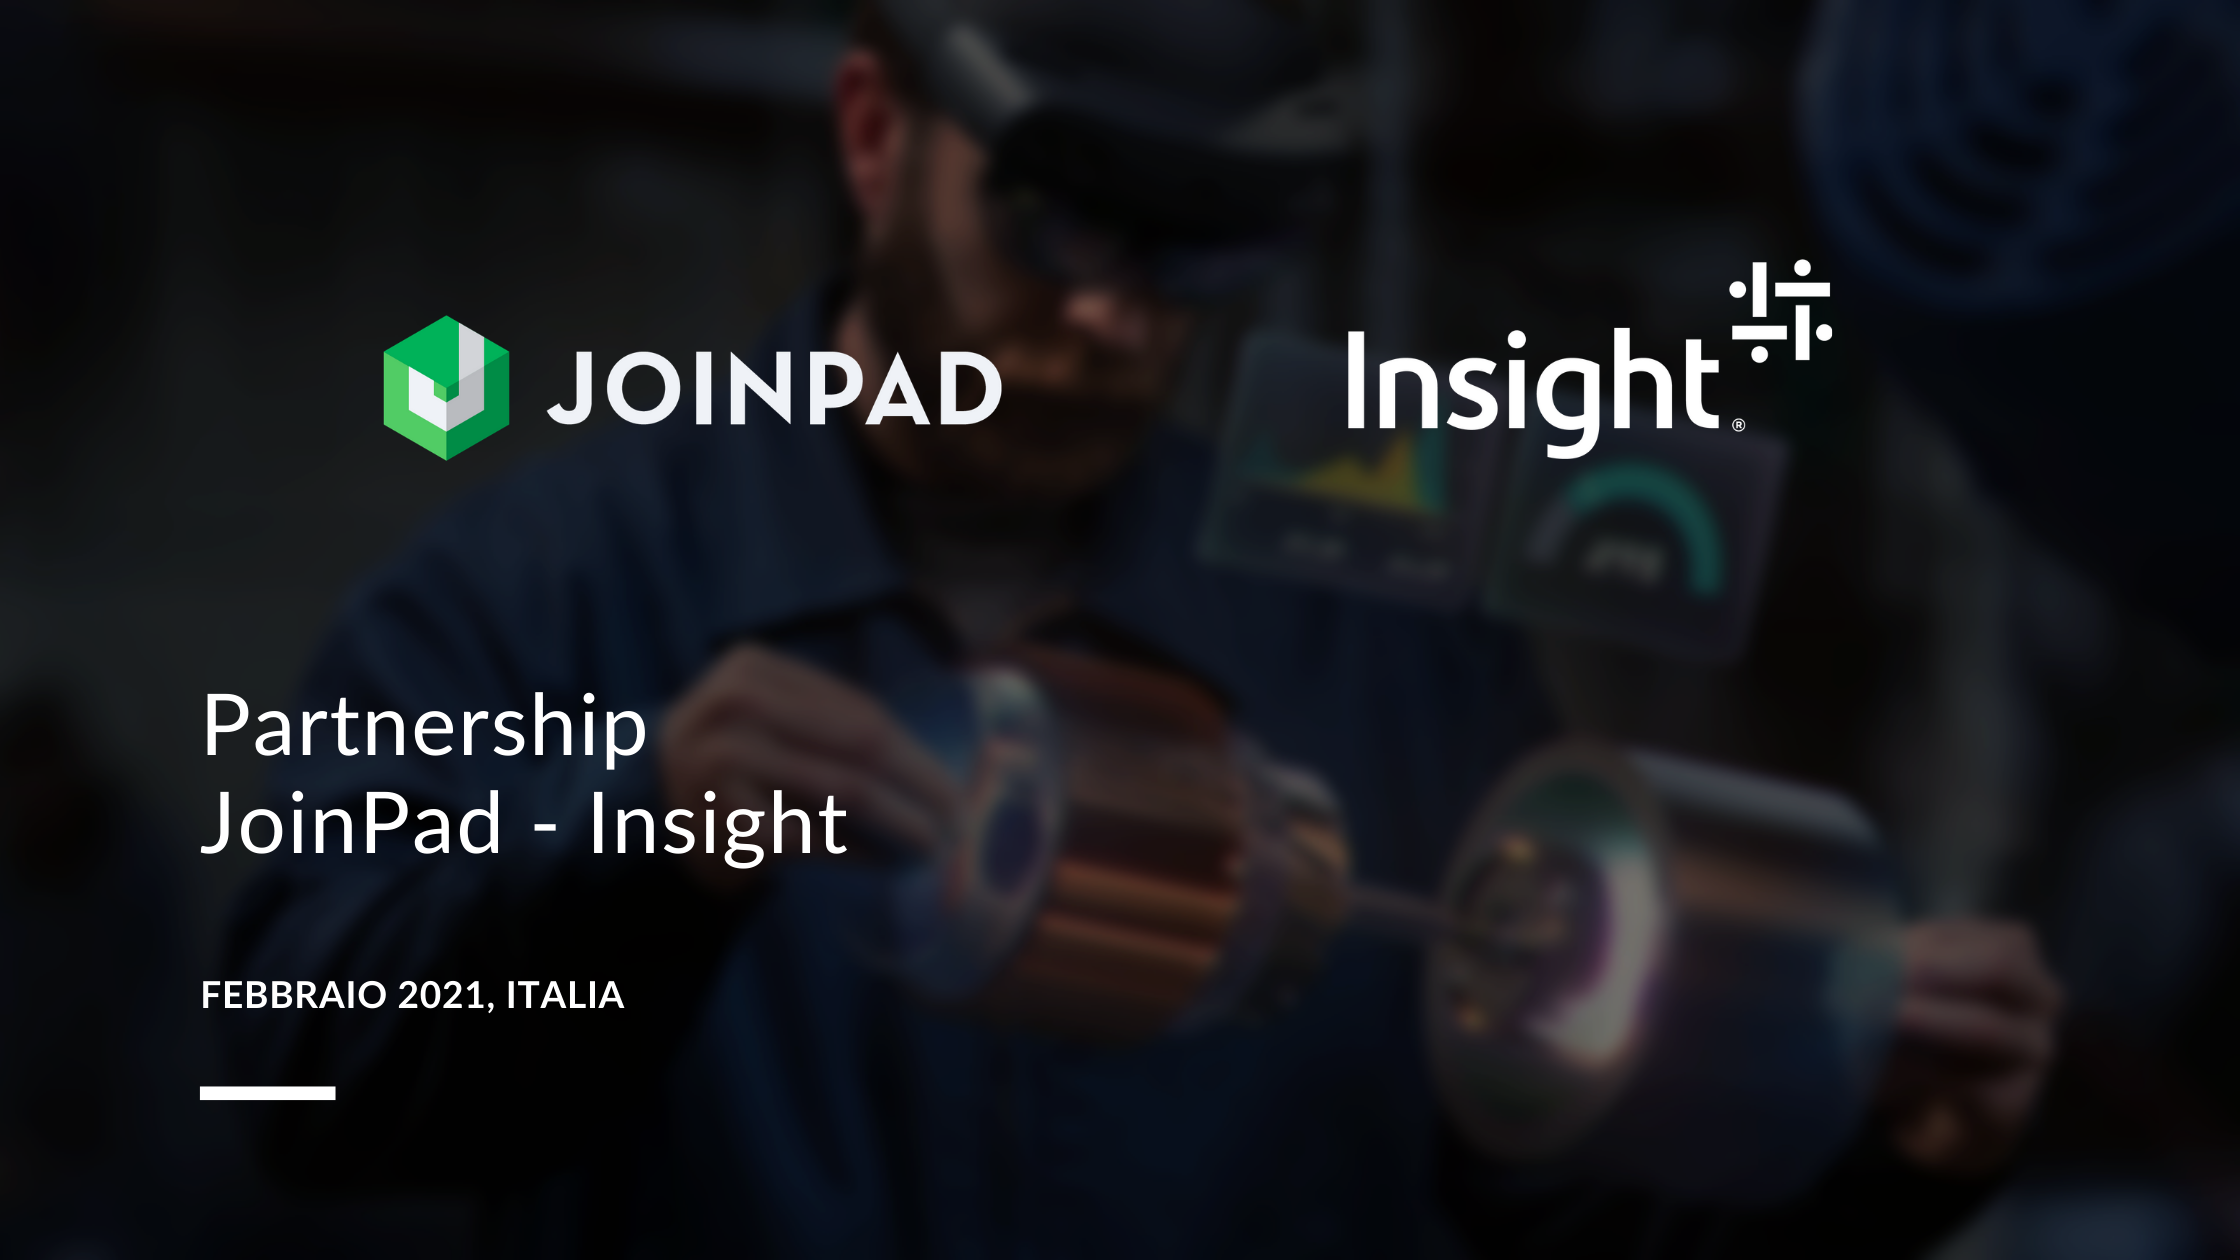 cover articolo partnership joinpad e insight italiano